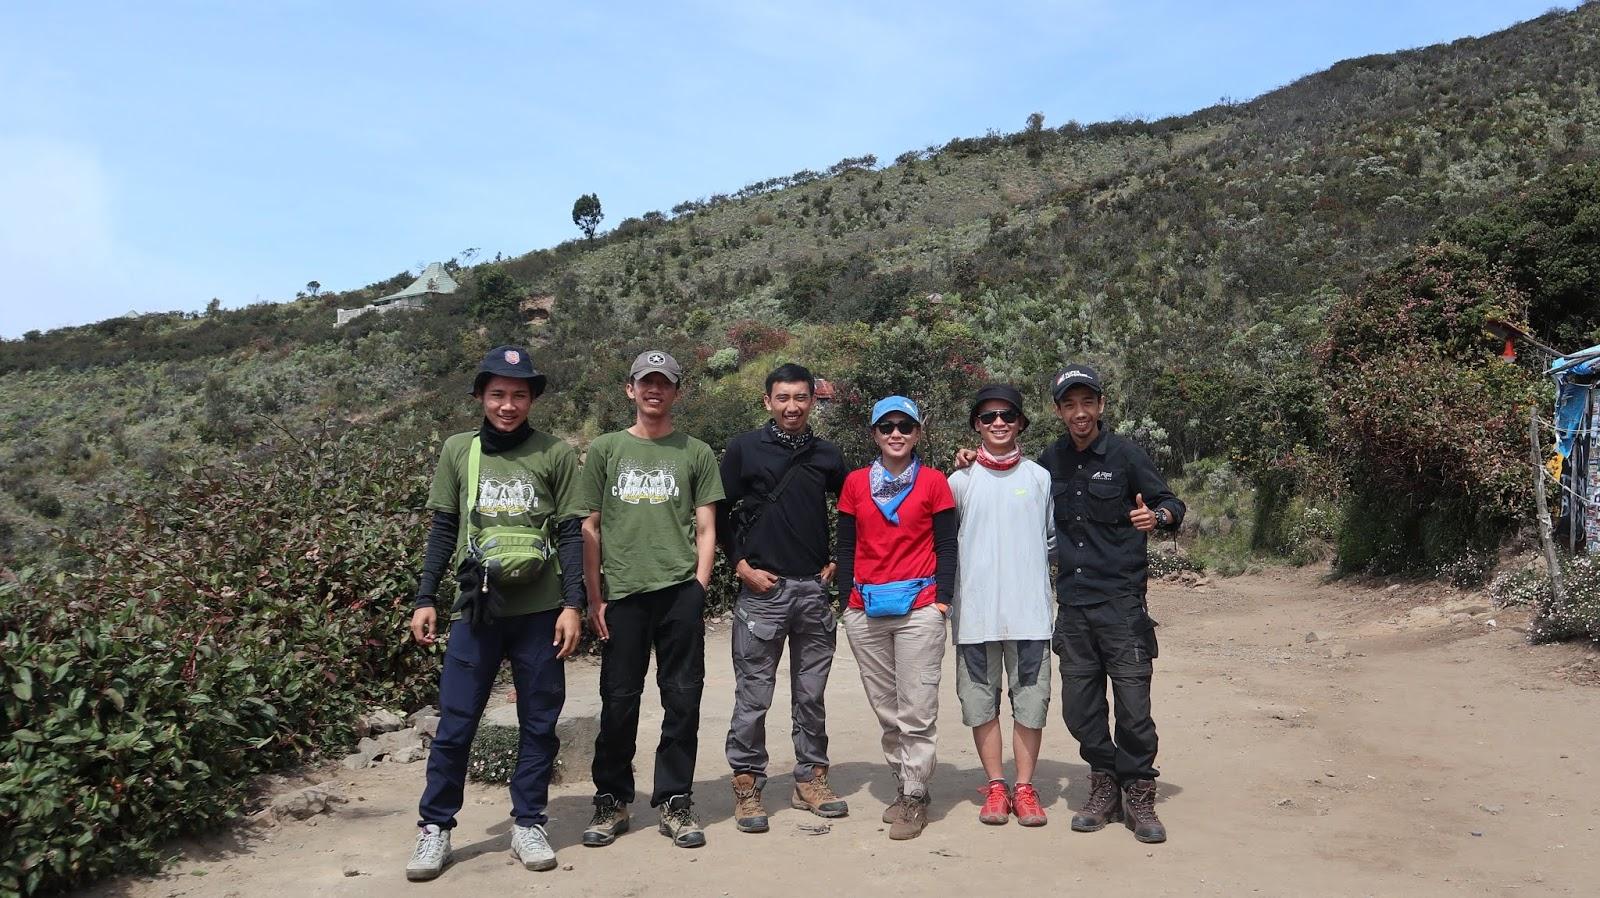 Jalur Pendakian Gunung Lawu Via Candi Cetho Tenda Inspirasi